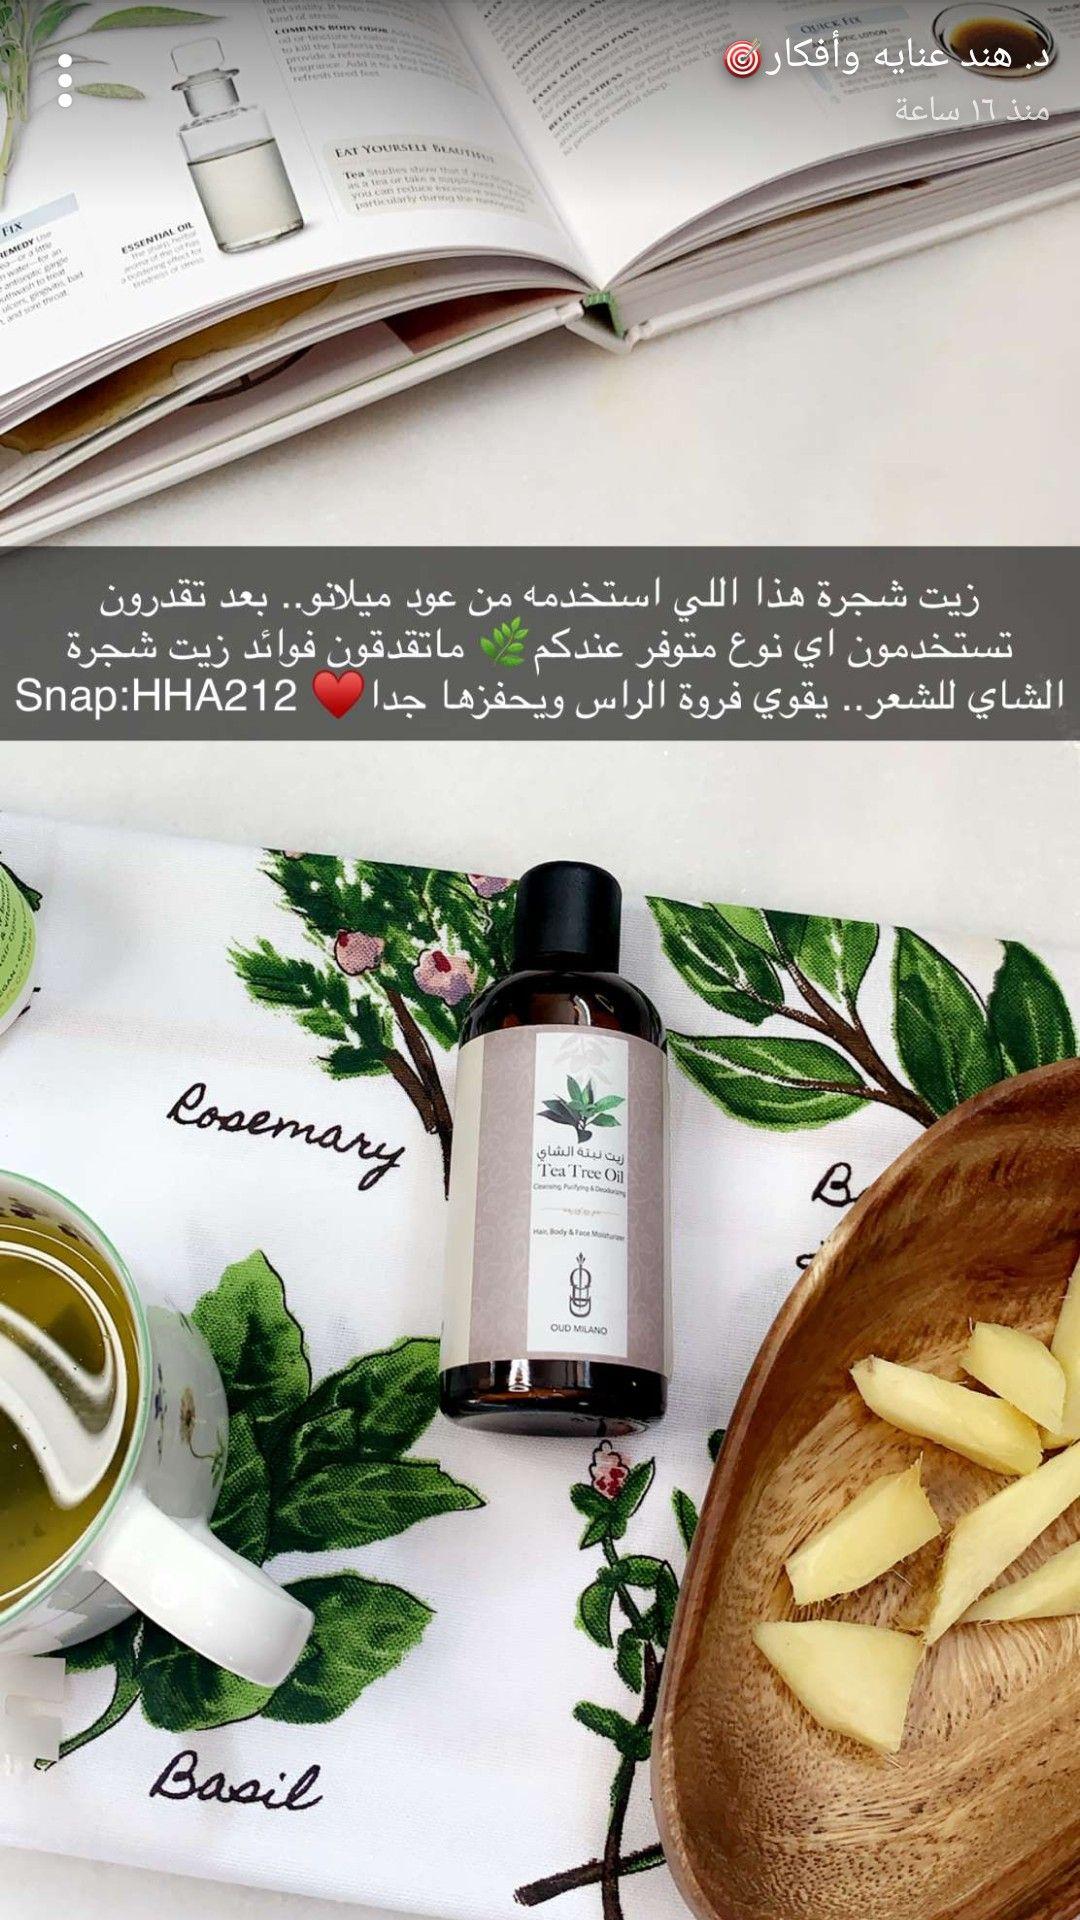 Pin By وهم On د هند عنايه وأفكار Face Cream Food Healthy